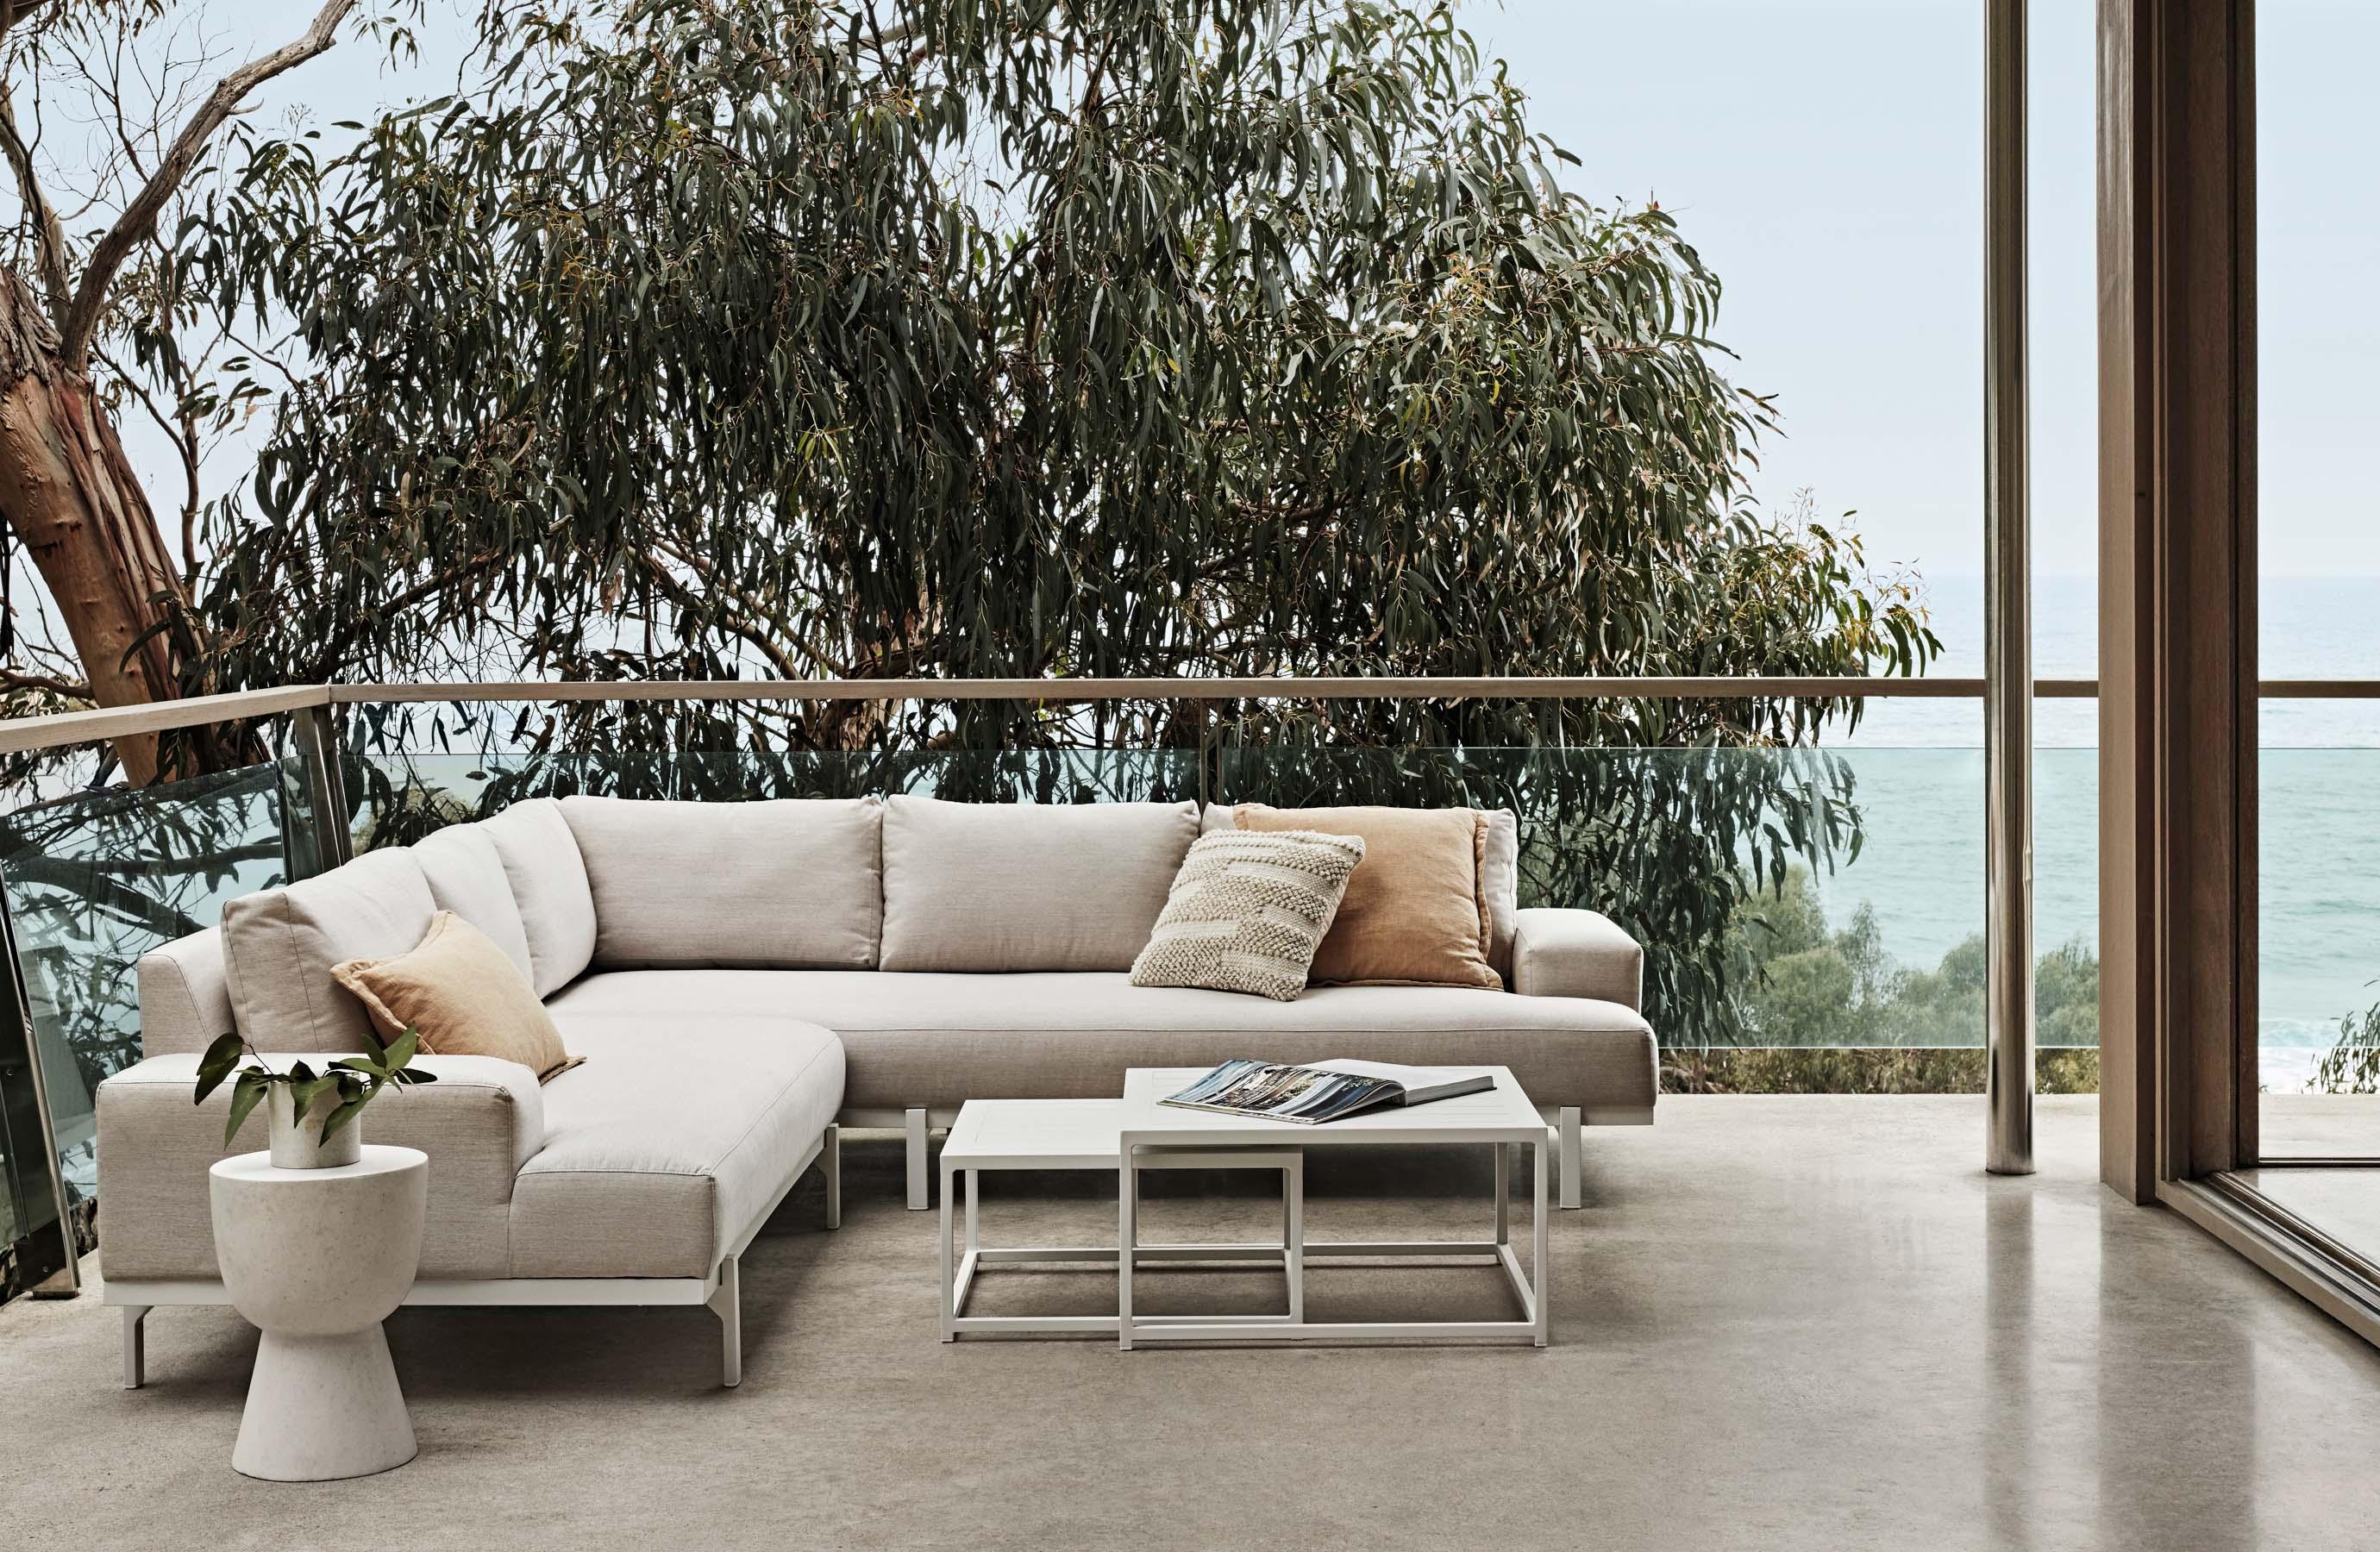 Furniture Gallery Sofas aruba-platform-chaise-03